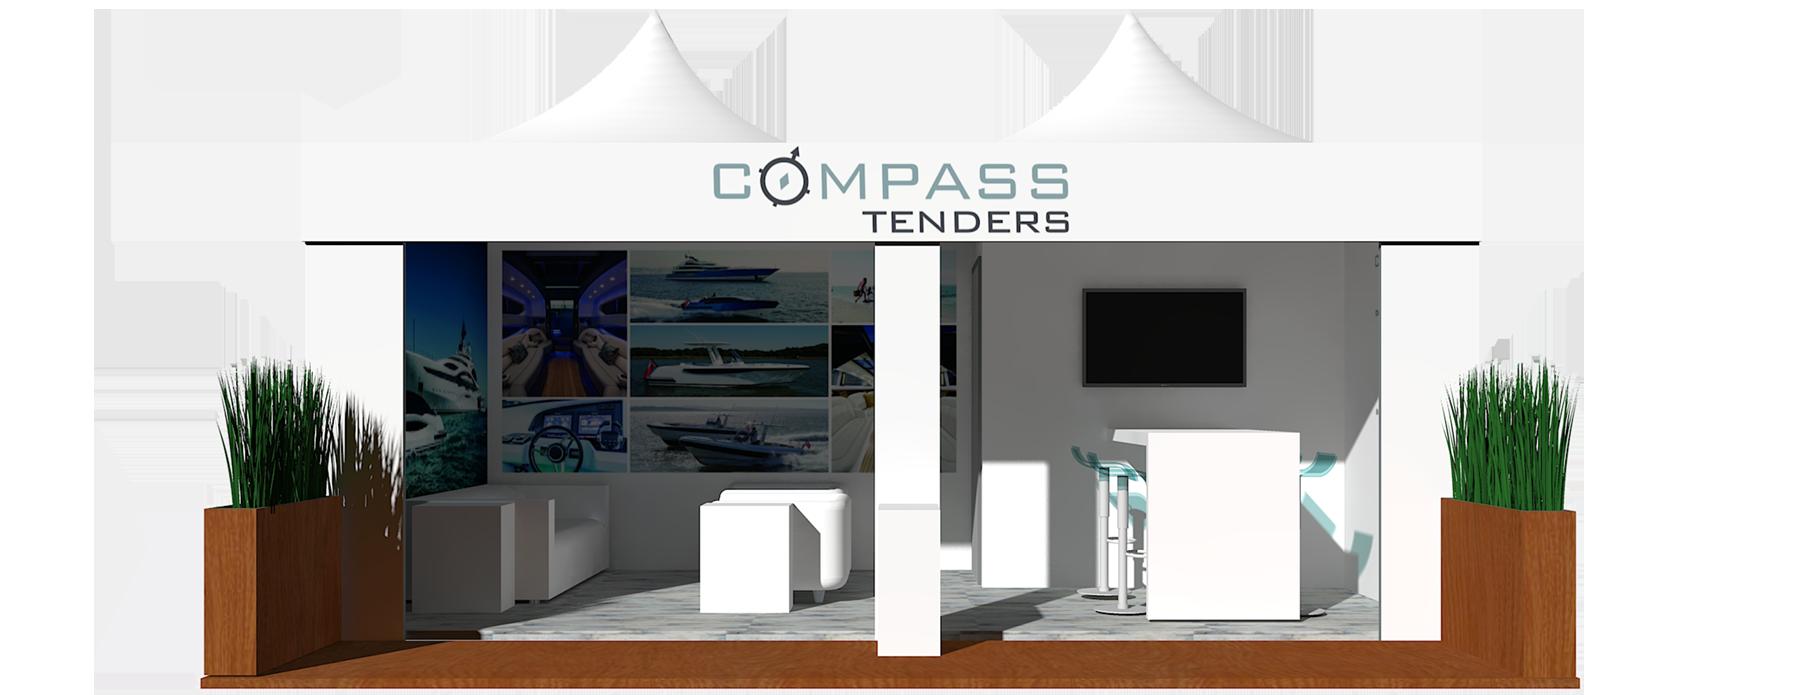 compass_monaco-yacht-show-2017